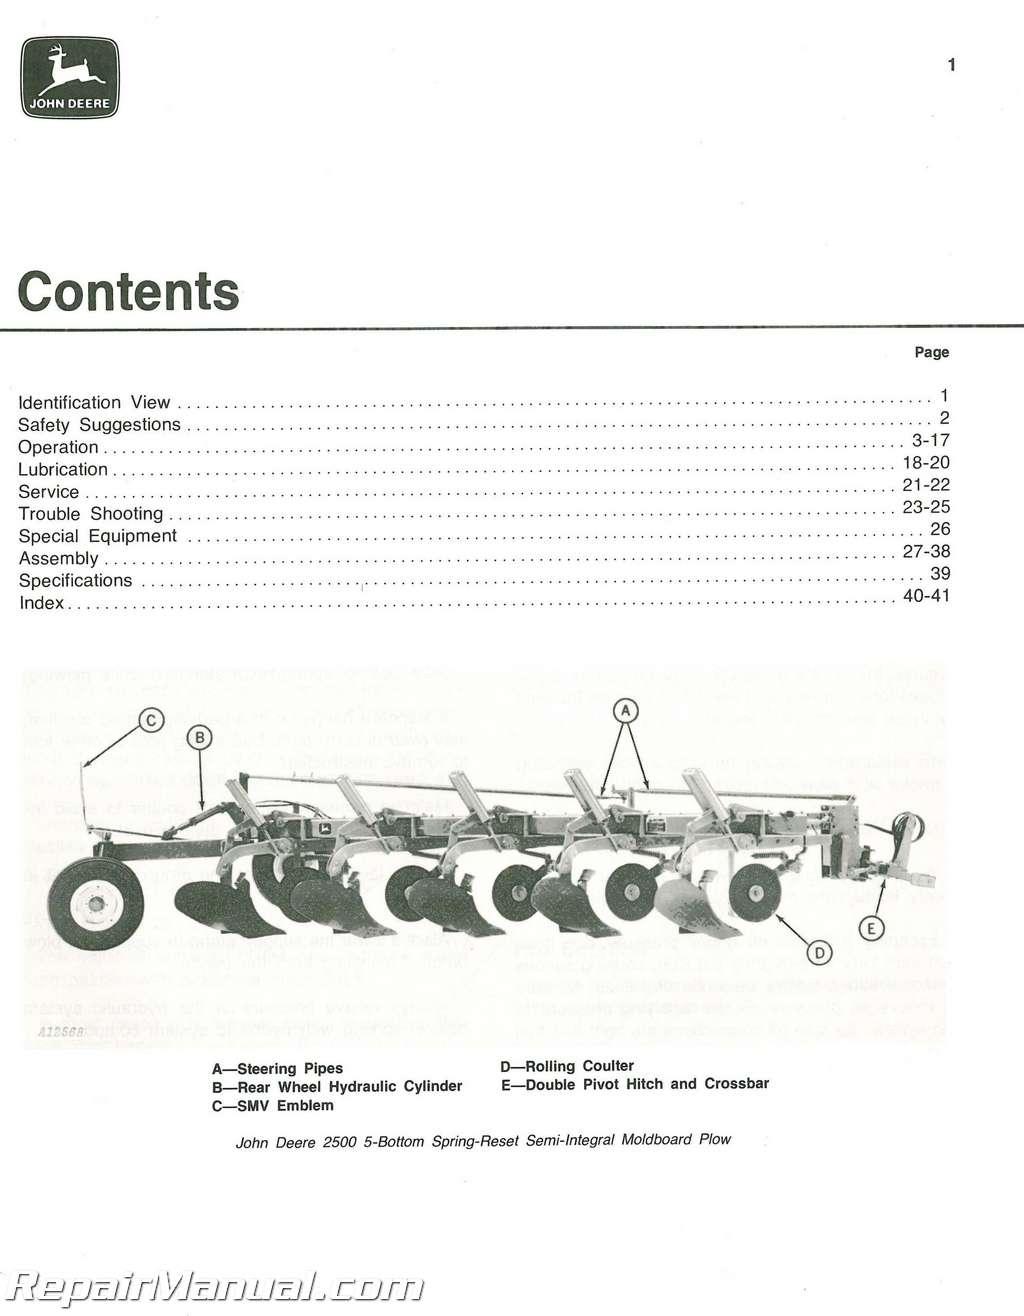 Used John Deere 2500 Spring-Reset Semi-Integral Moldboard Plows Operators  Manual